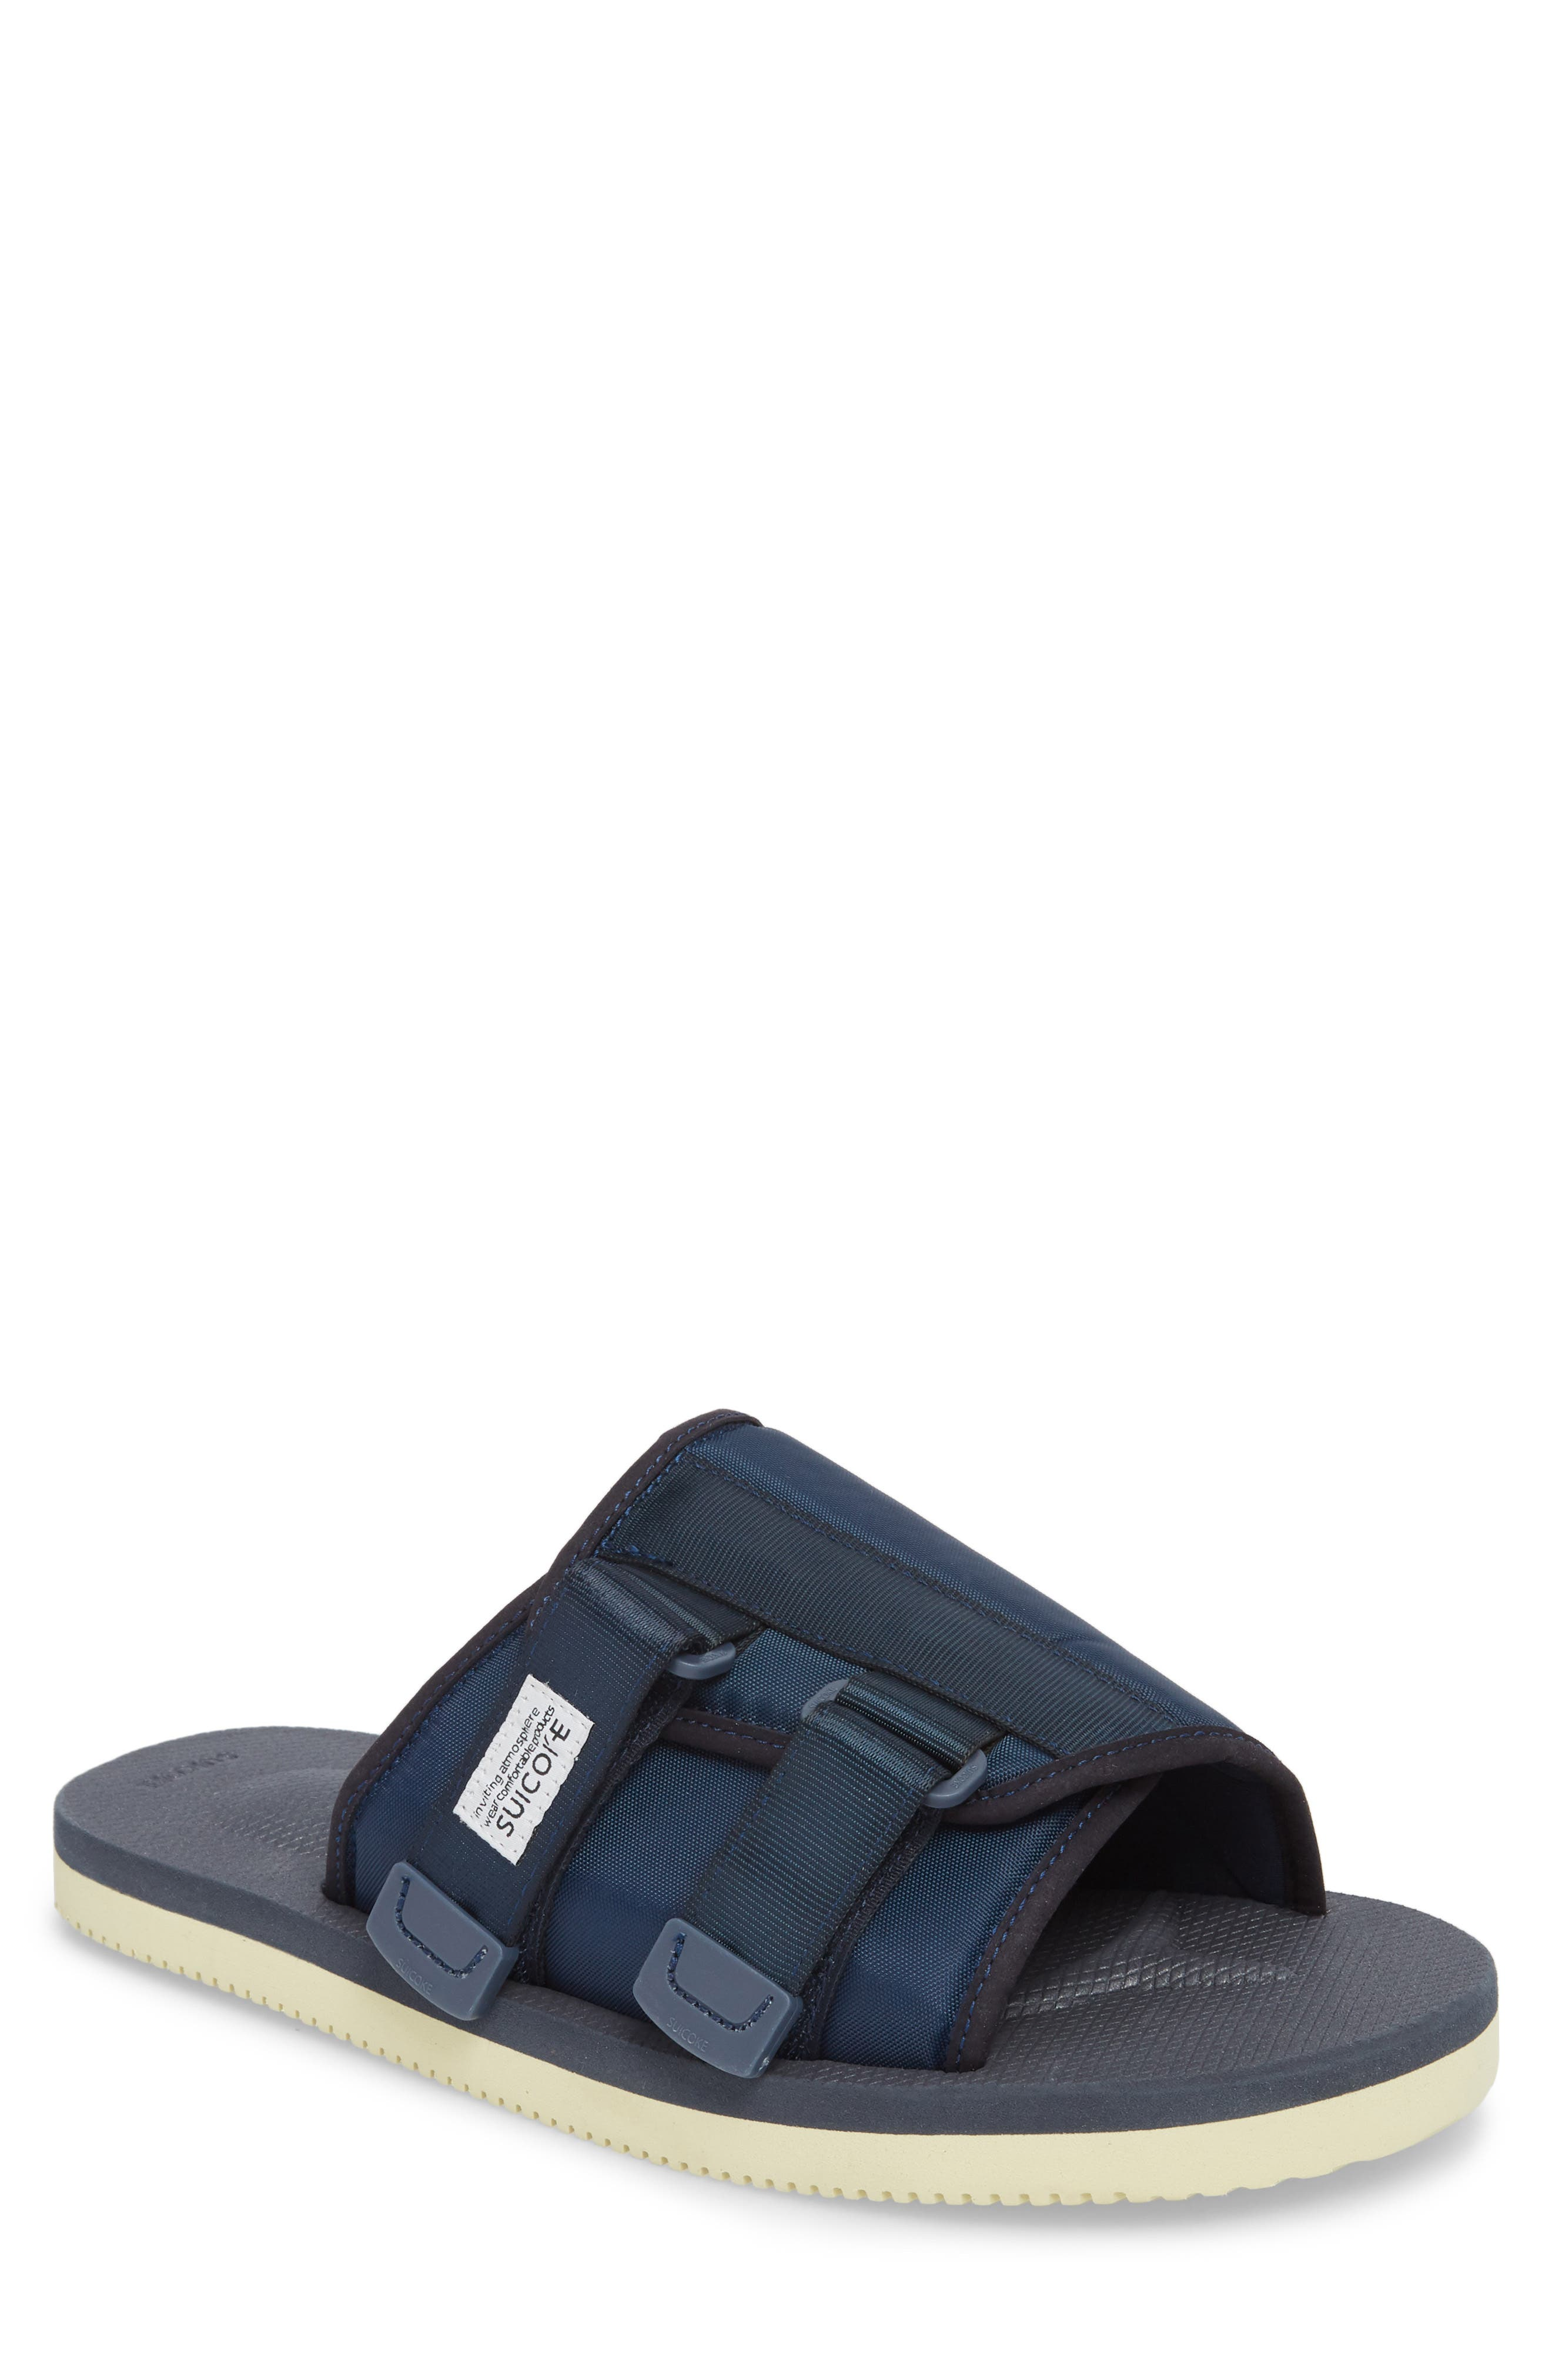 Suicoke Kaw Cab Slide Sandal (Men)